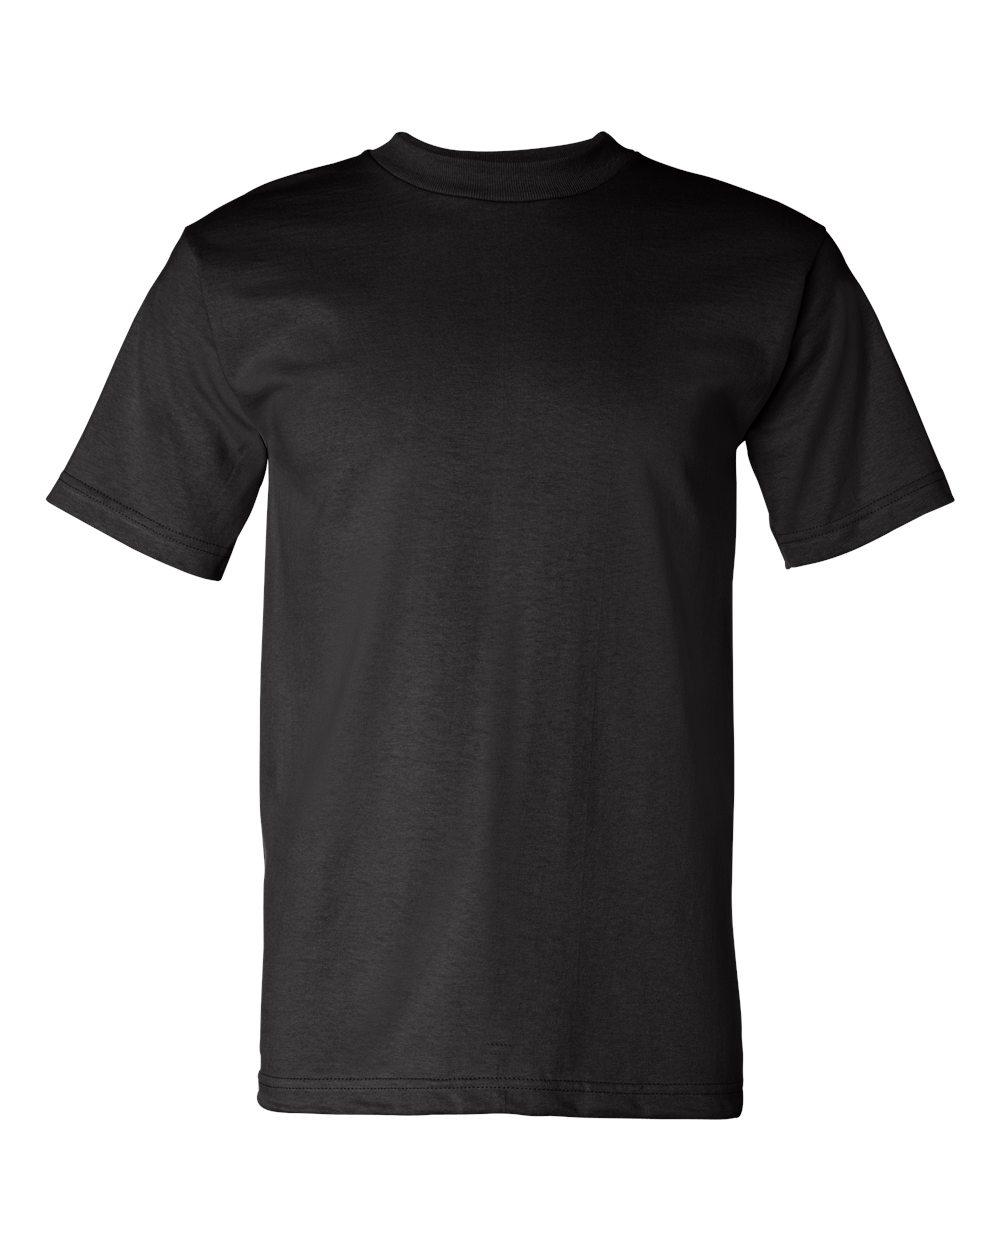 Bayside-Mens-Cotton-Blank-USA-Made-Short-Sleeve-T-Shirt-5100-up-to-5XL thumbnail 9